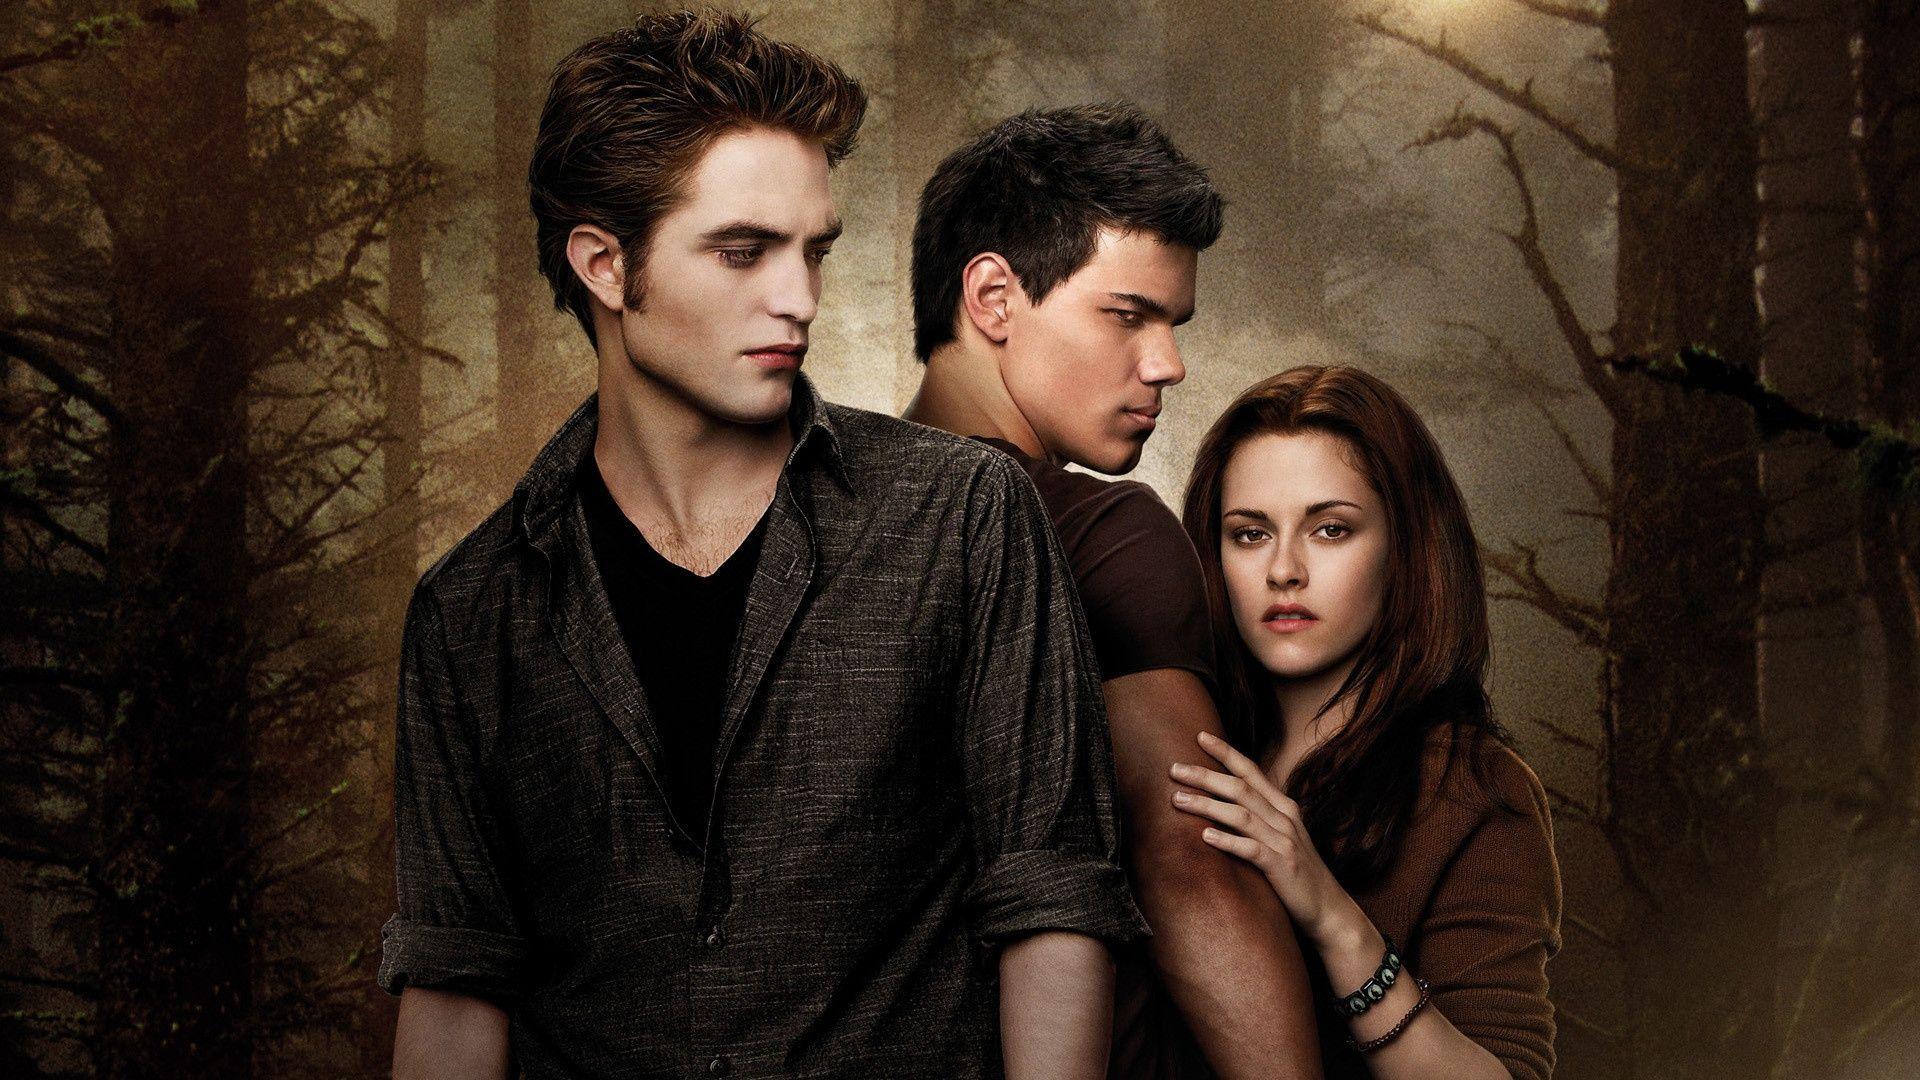 Twilight movie torrent btmon